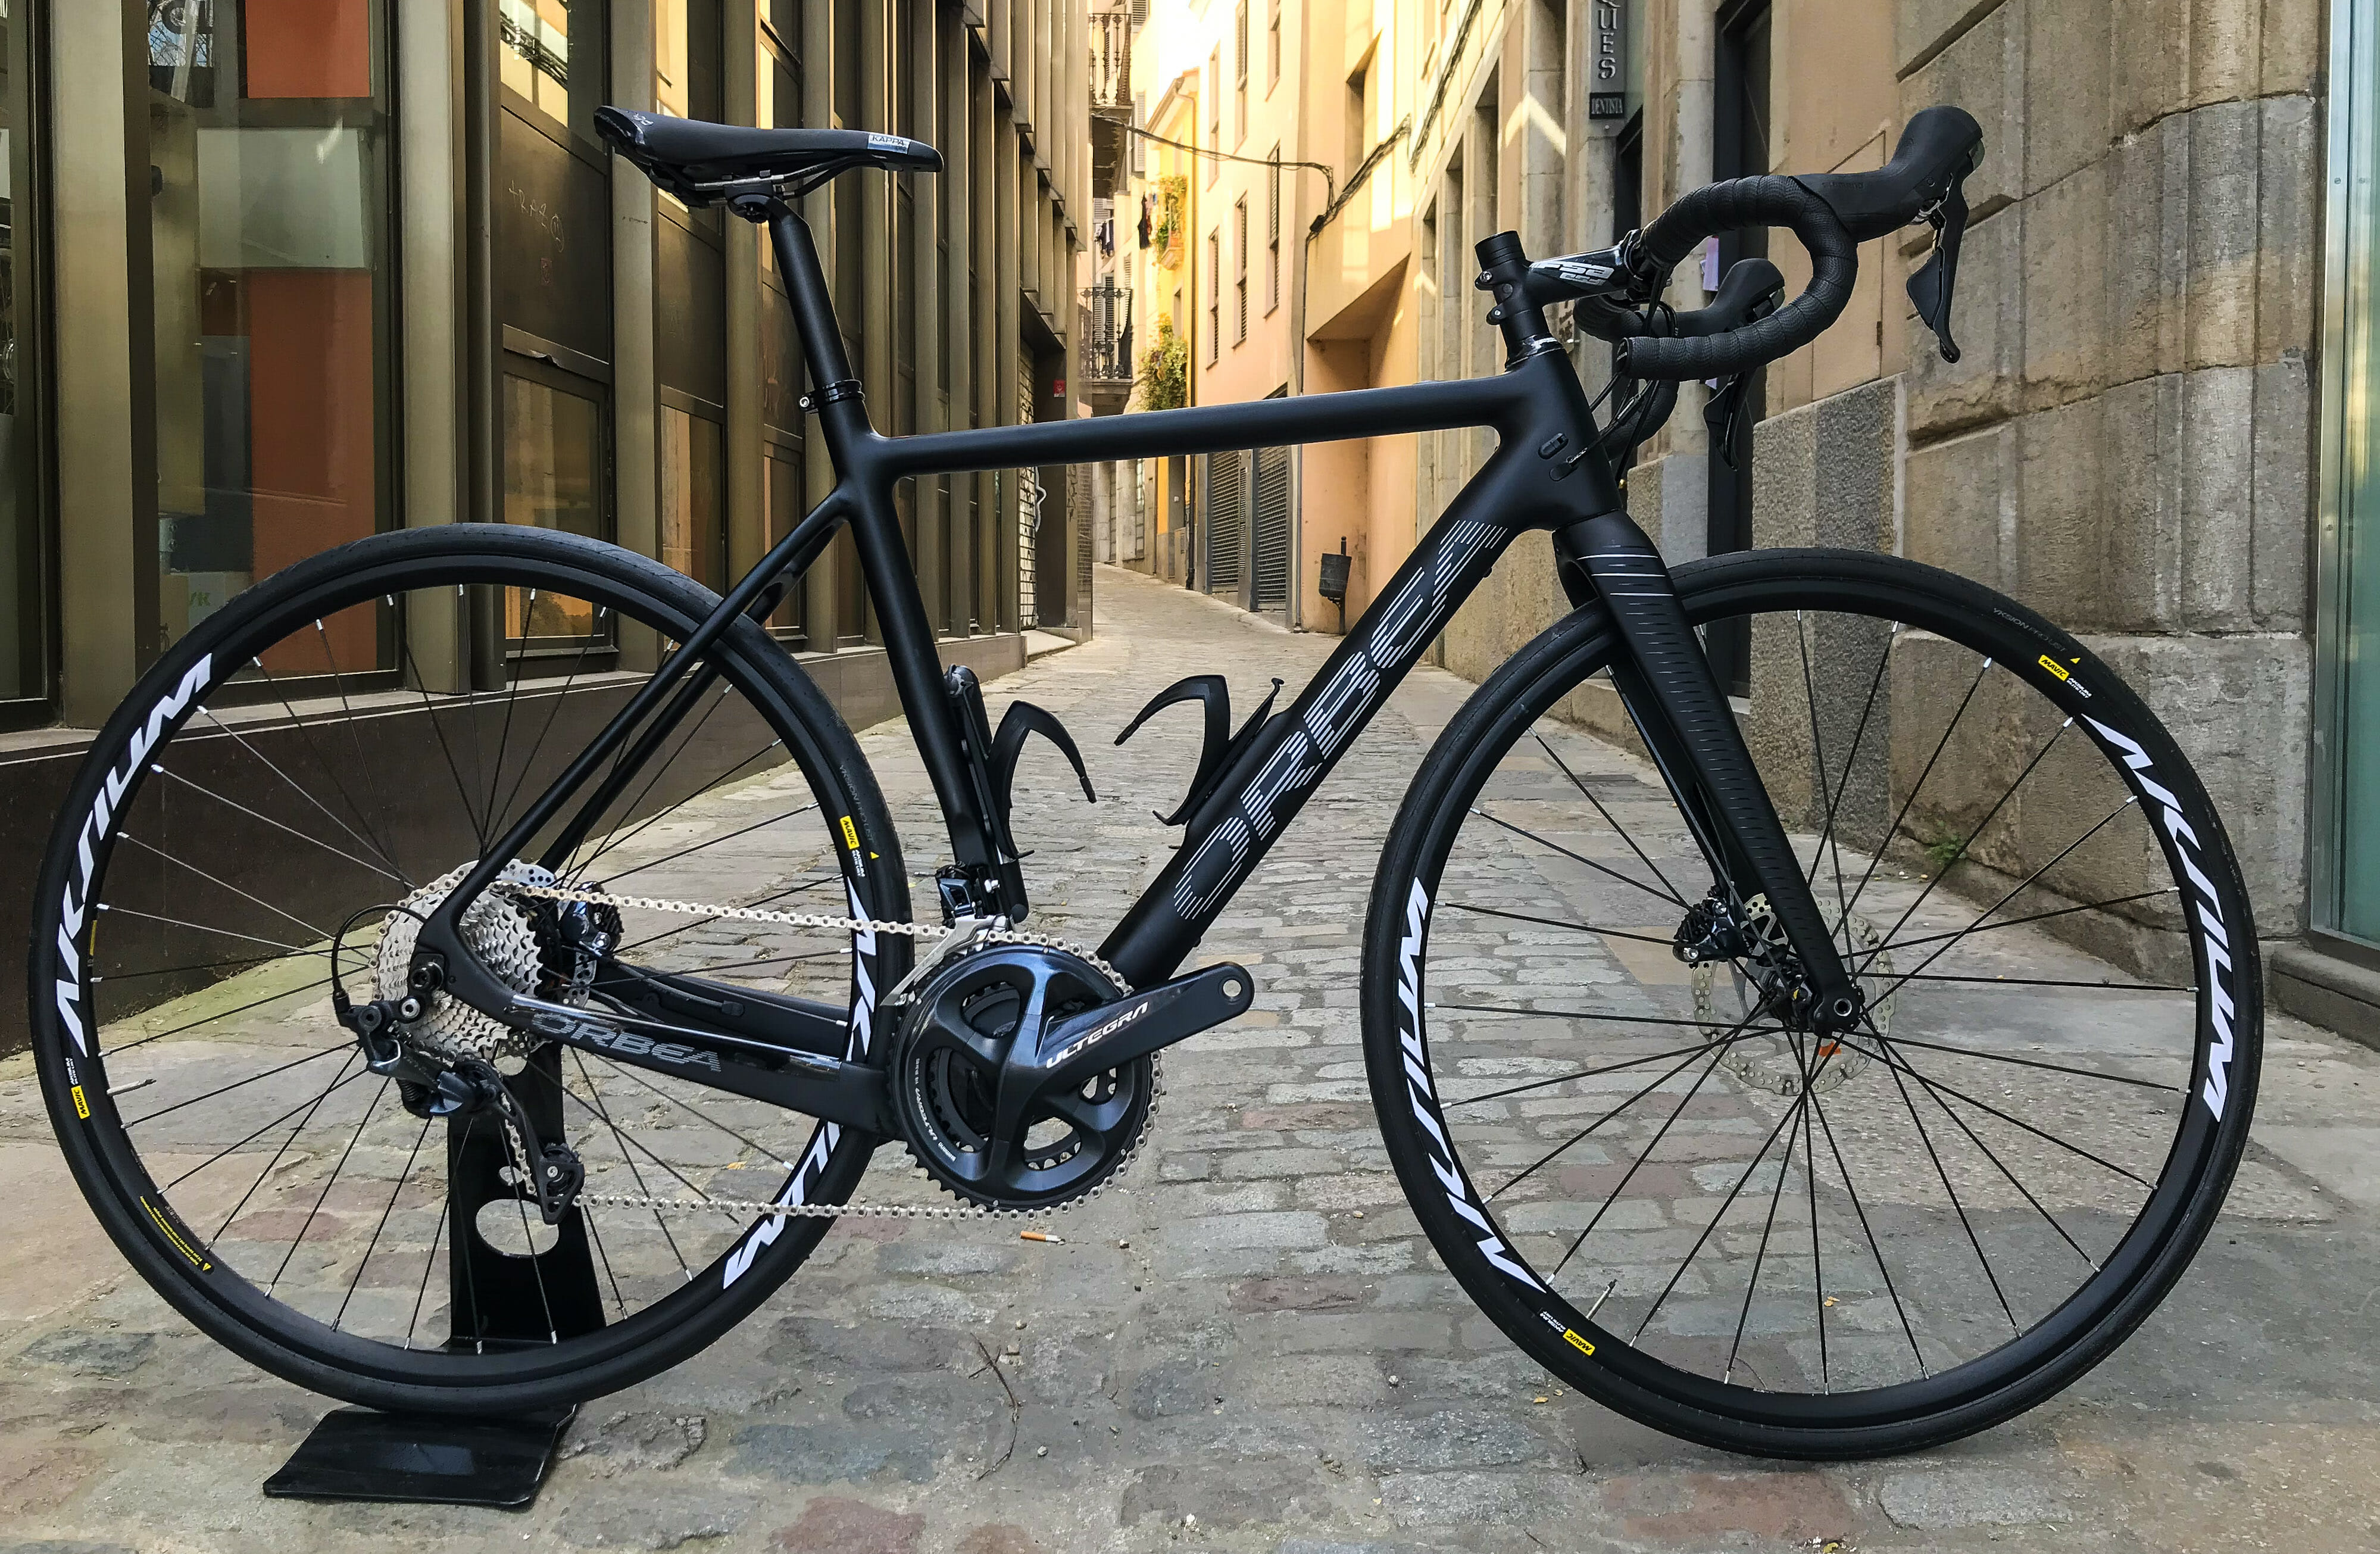 European-Cycling-Tour-Eat-Sleep-Cycle-Bike-Rental